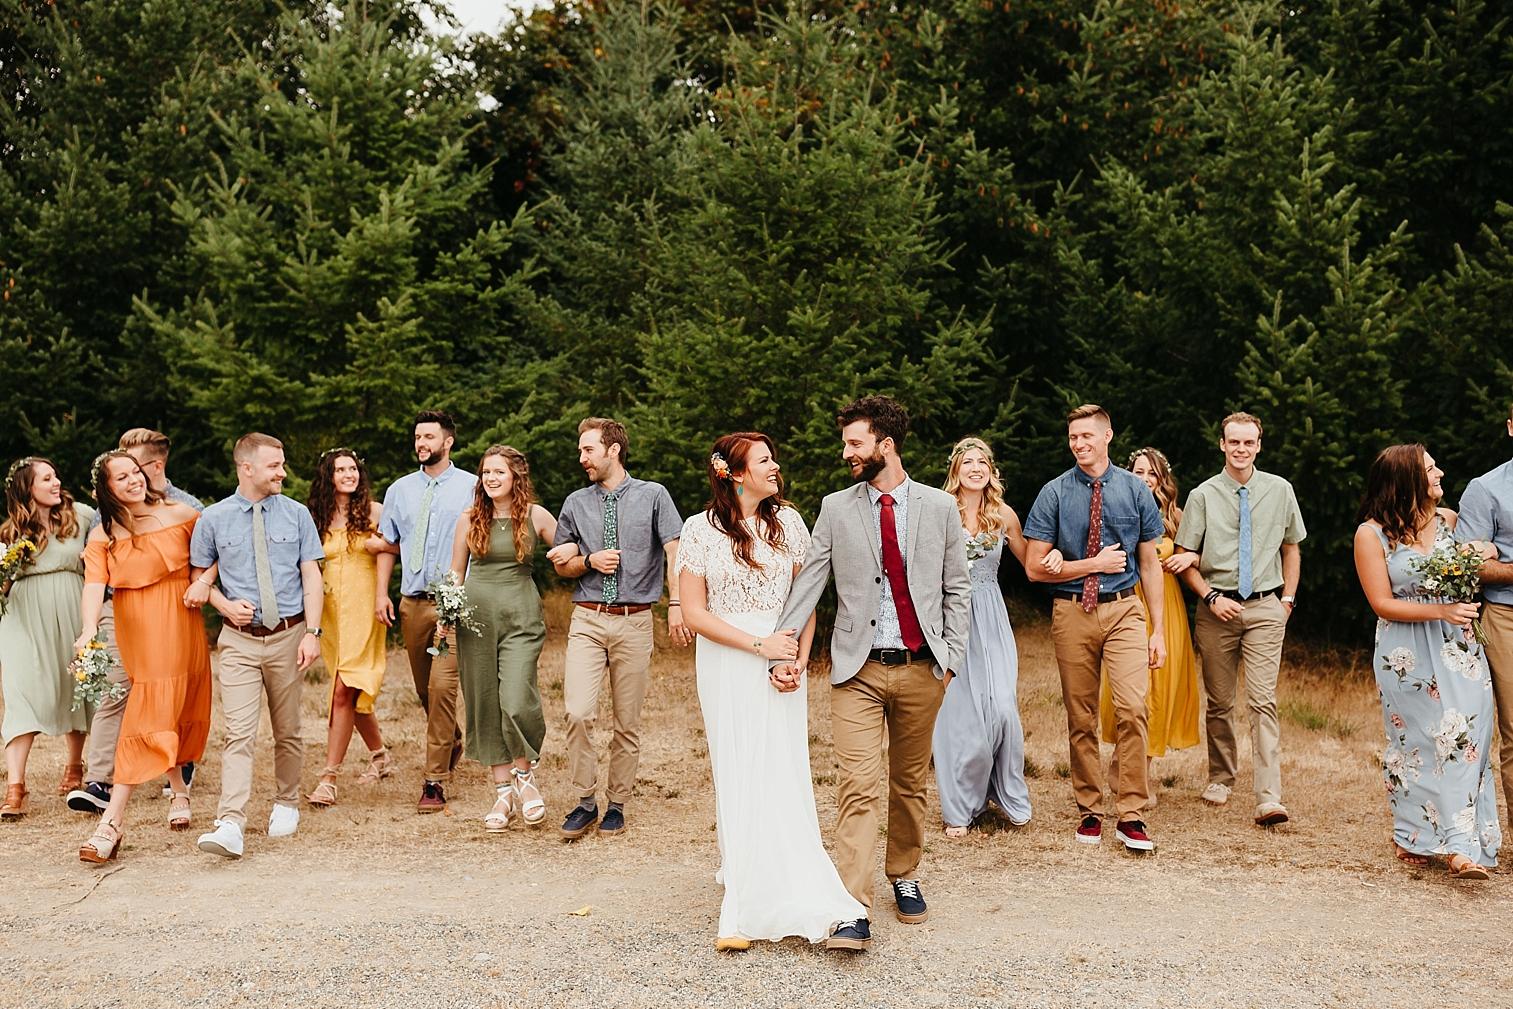 Summer-Camp-Themed-Wedding-53.jpg